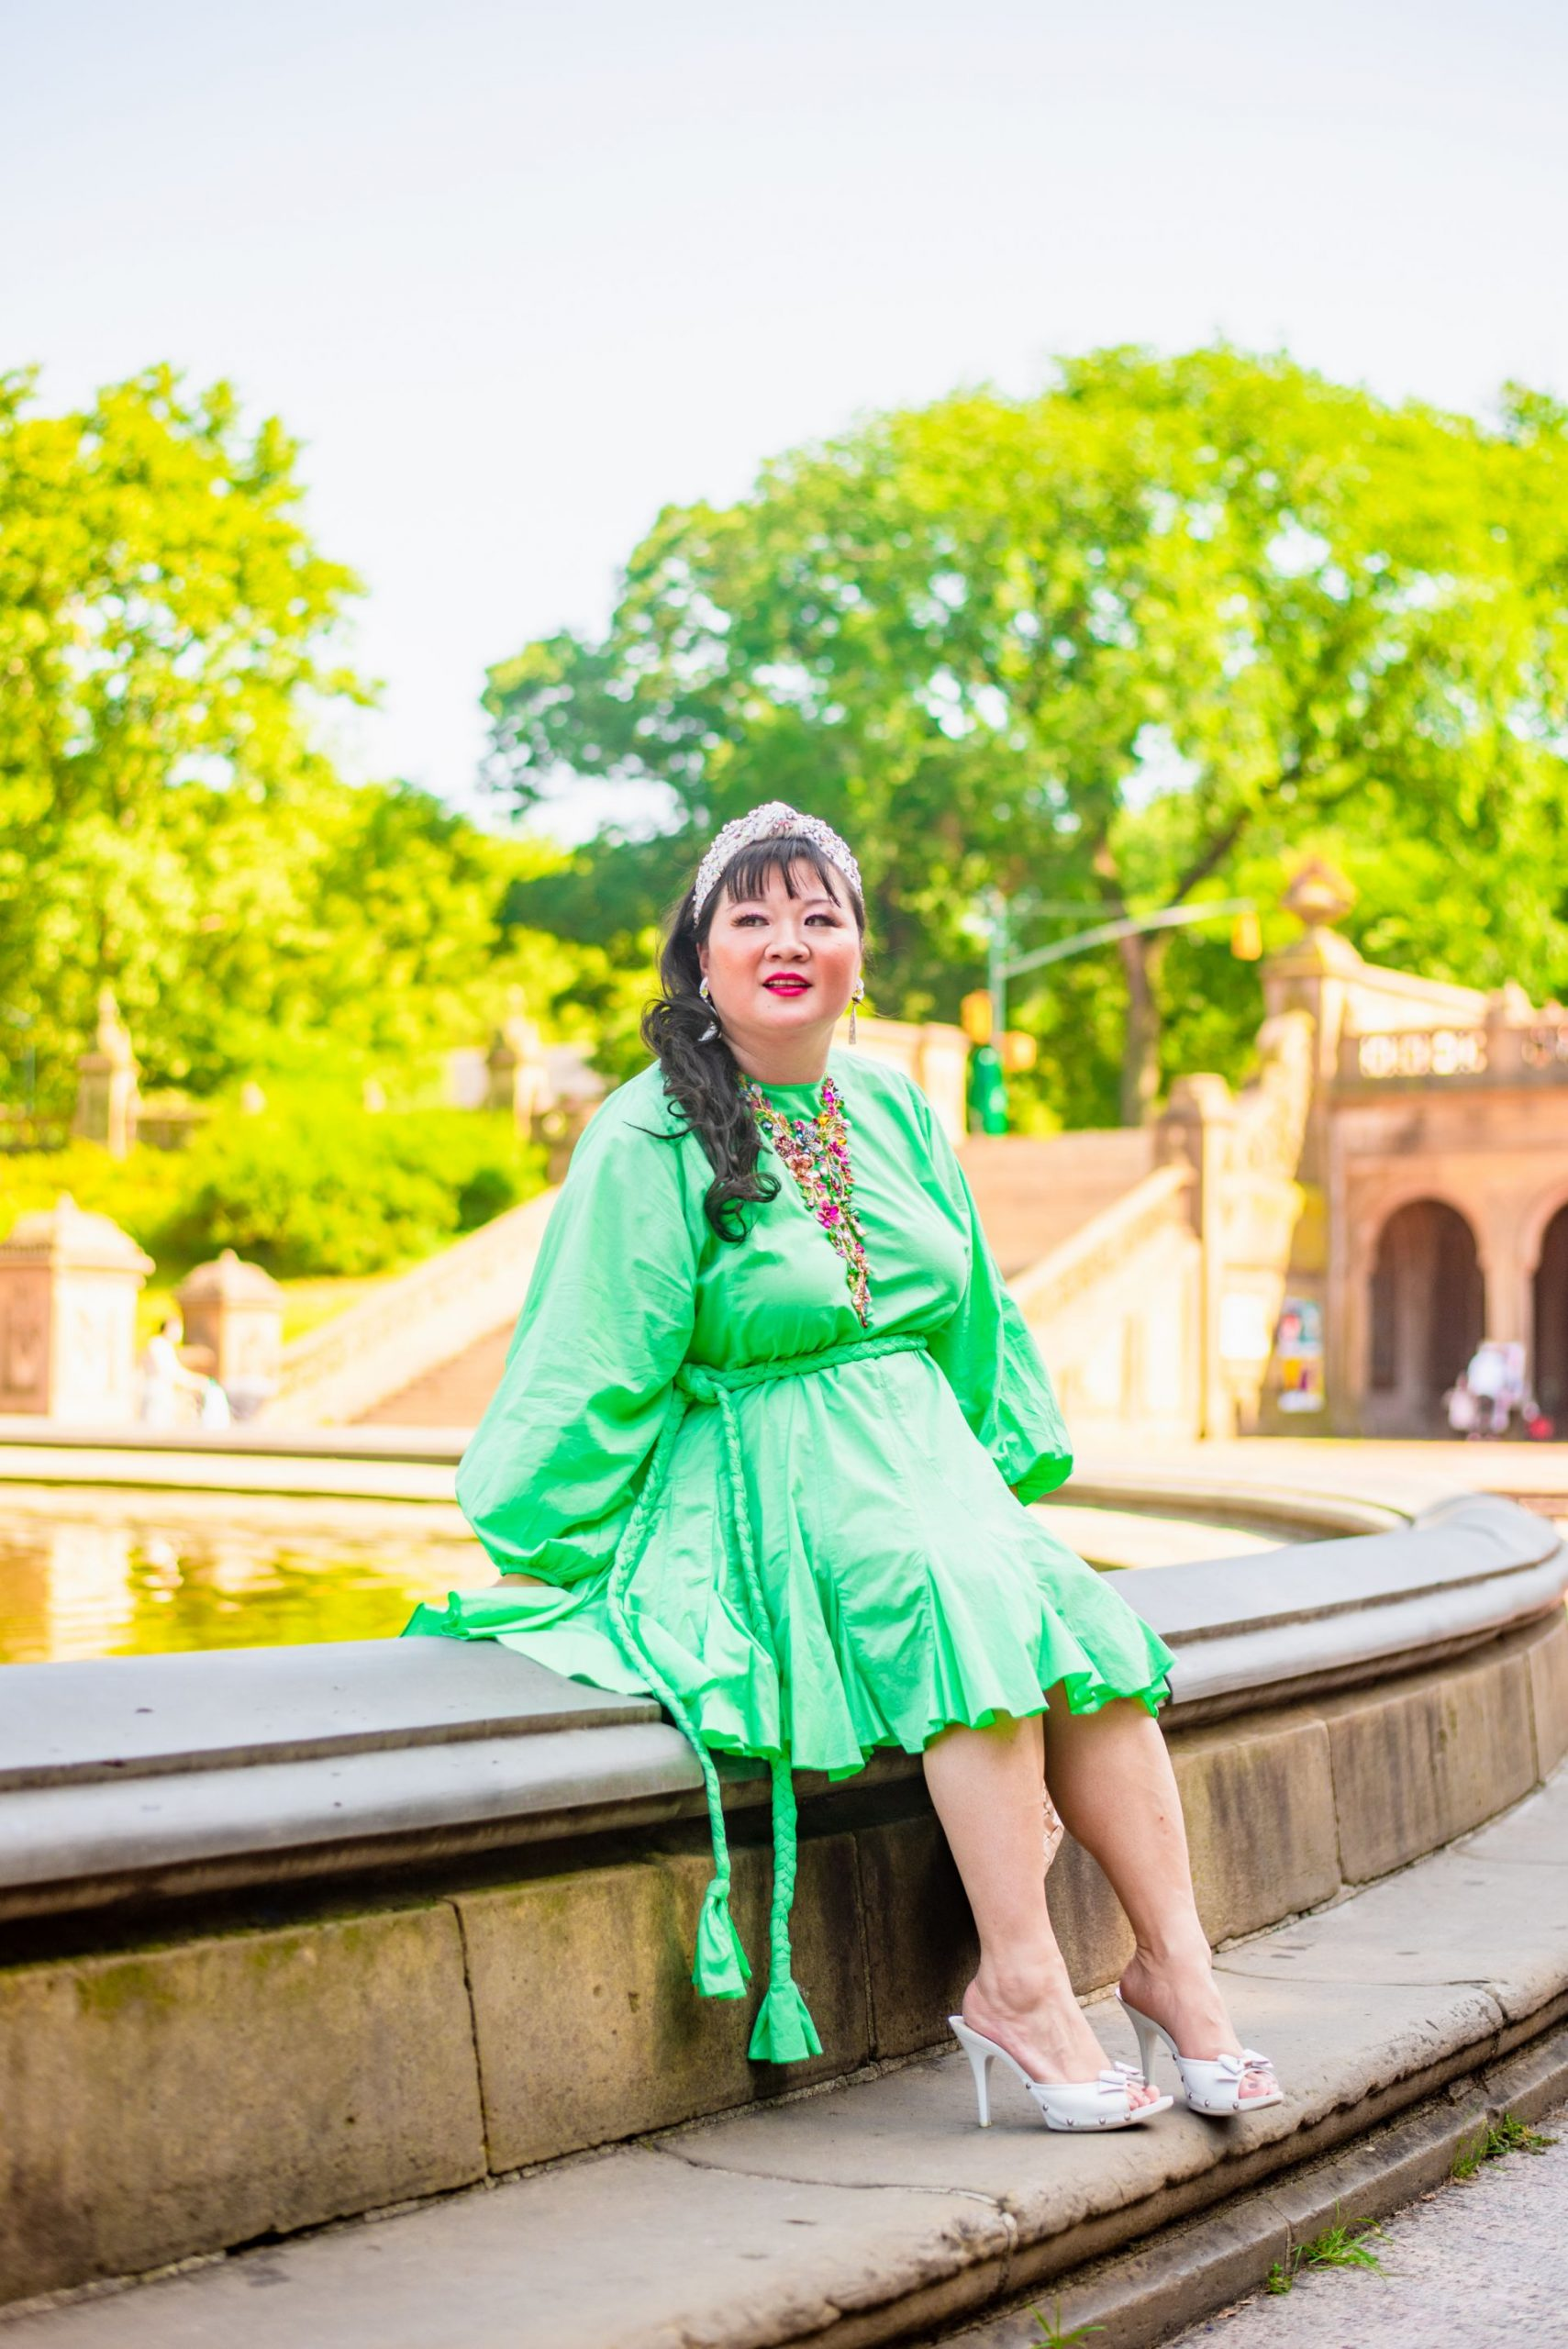 Bethesda Fountain Central Park photoshoot location